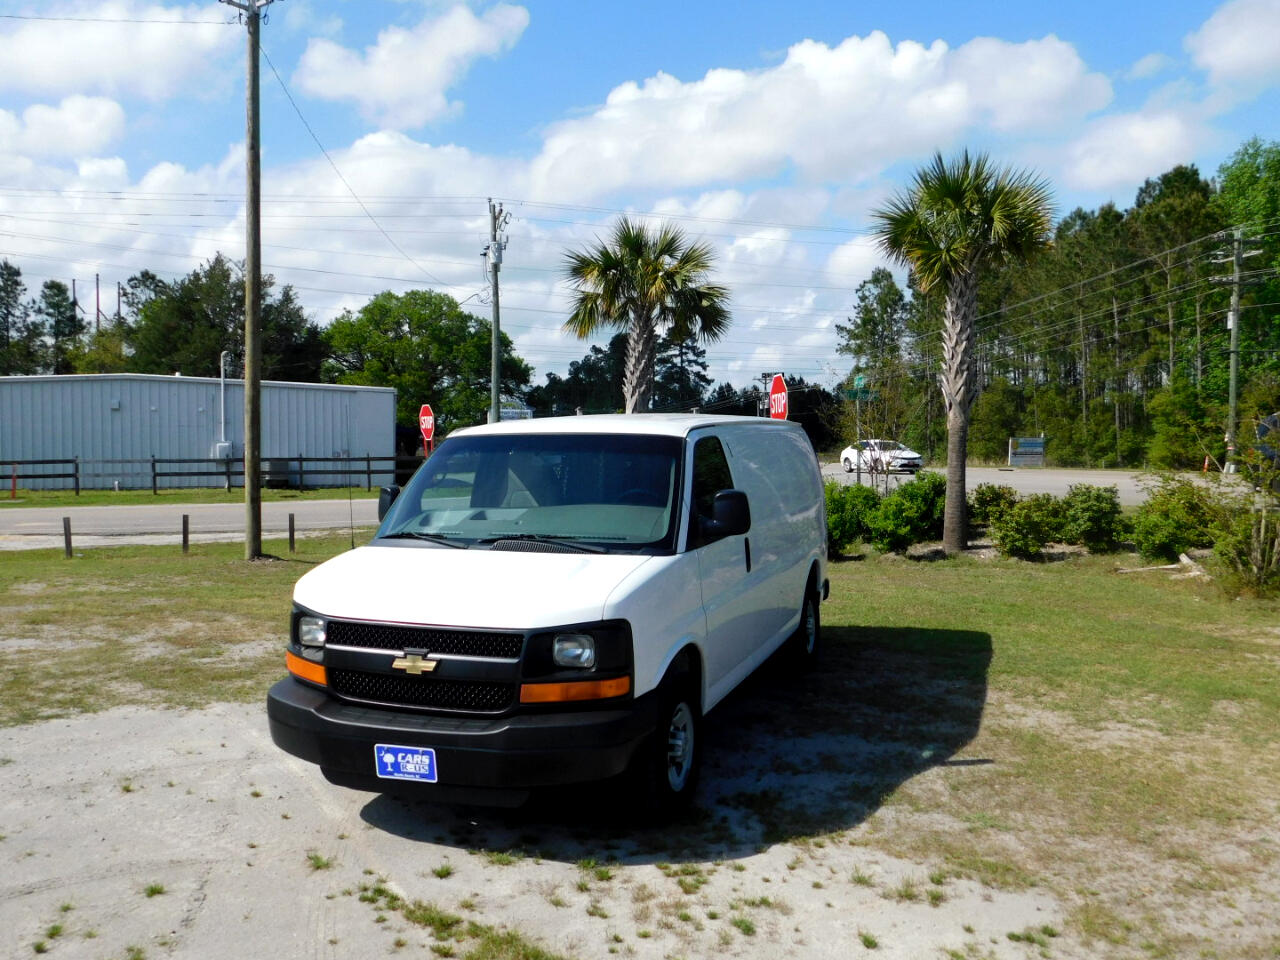 2014 Chevrolet Chevy Cargo Van